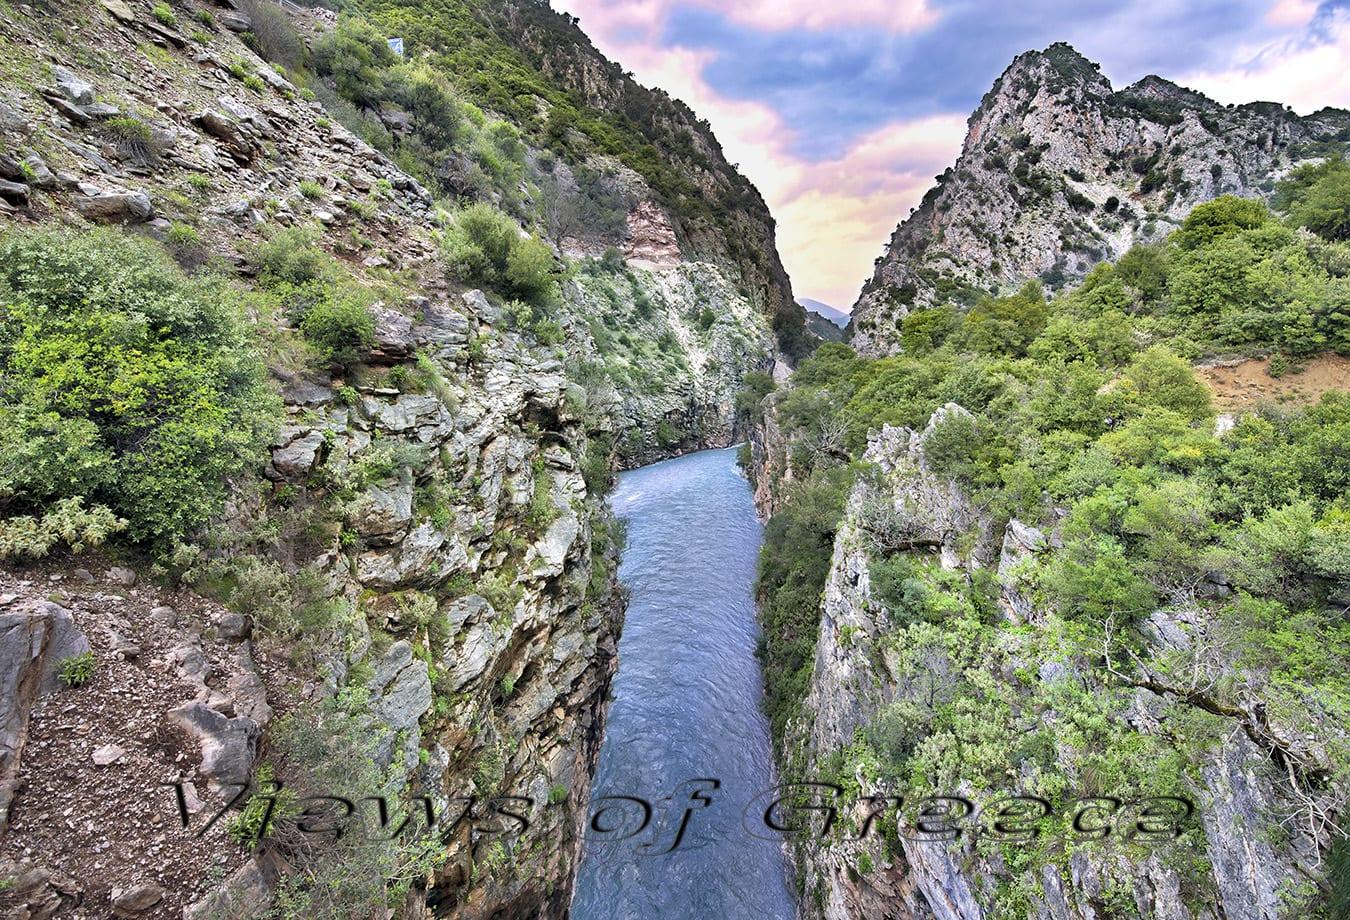 karpenisi, greece, evrytania, lake, landscape, mountains, outdoors, central greece, lake kremasta, river, river shore, bridge, γέφυρα Επισκοπής, λίμνη Κρεμαστών, Ευρυτανία, Άγραφα, Τρικεριώτης, Μέγδοβας, Αχελώος, γεφύρι Μανώλη, διαδρομές, rafting,